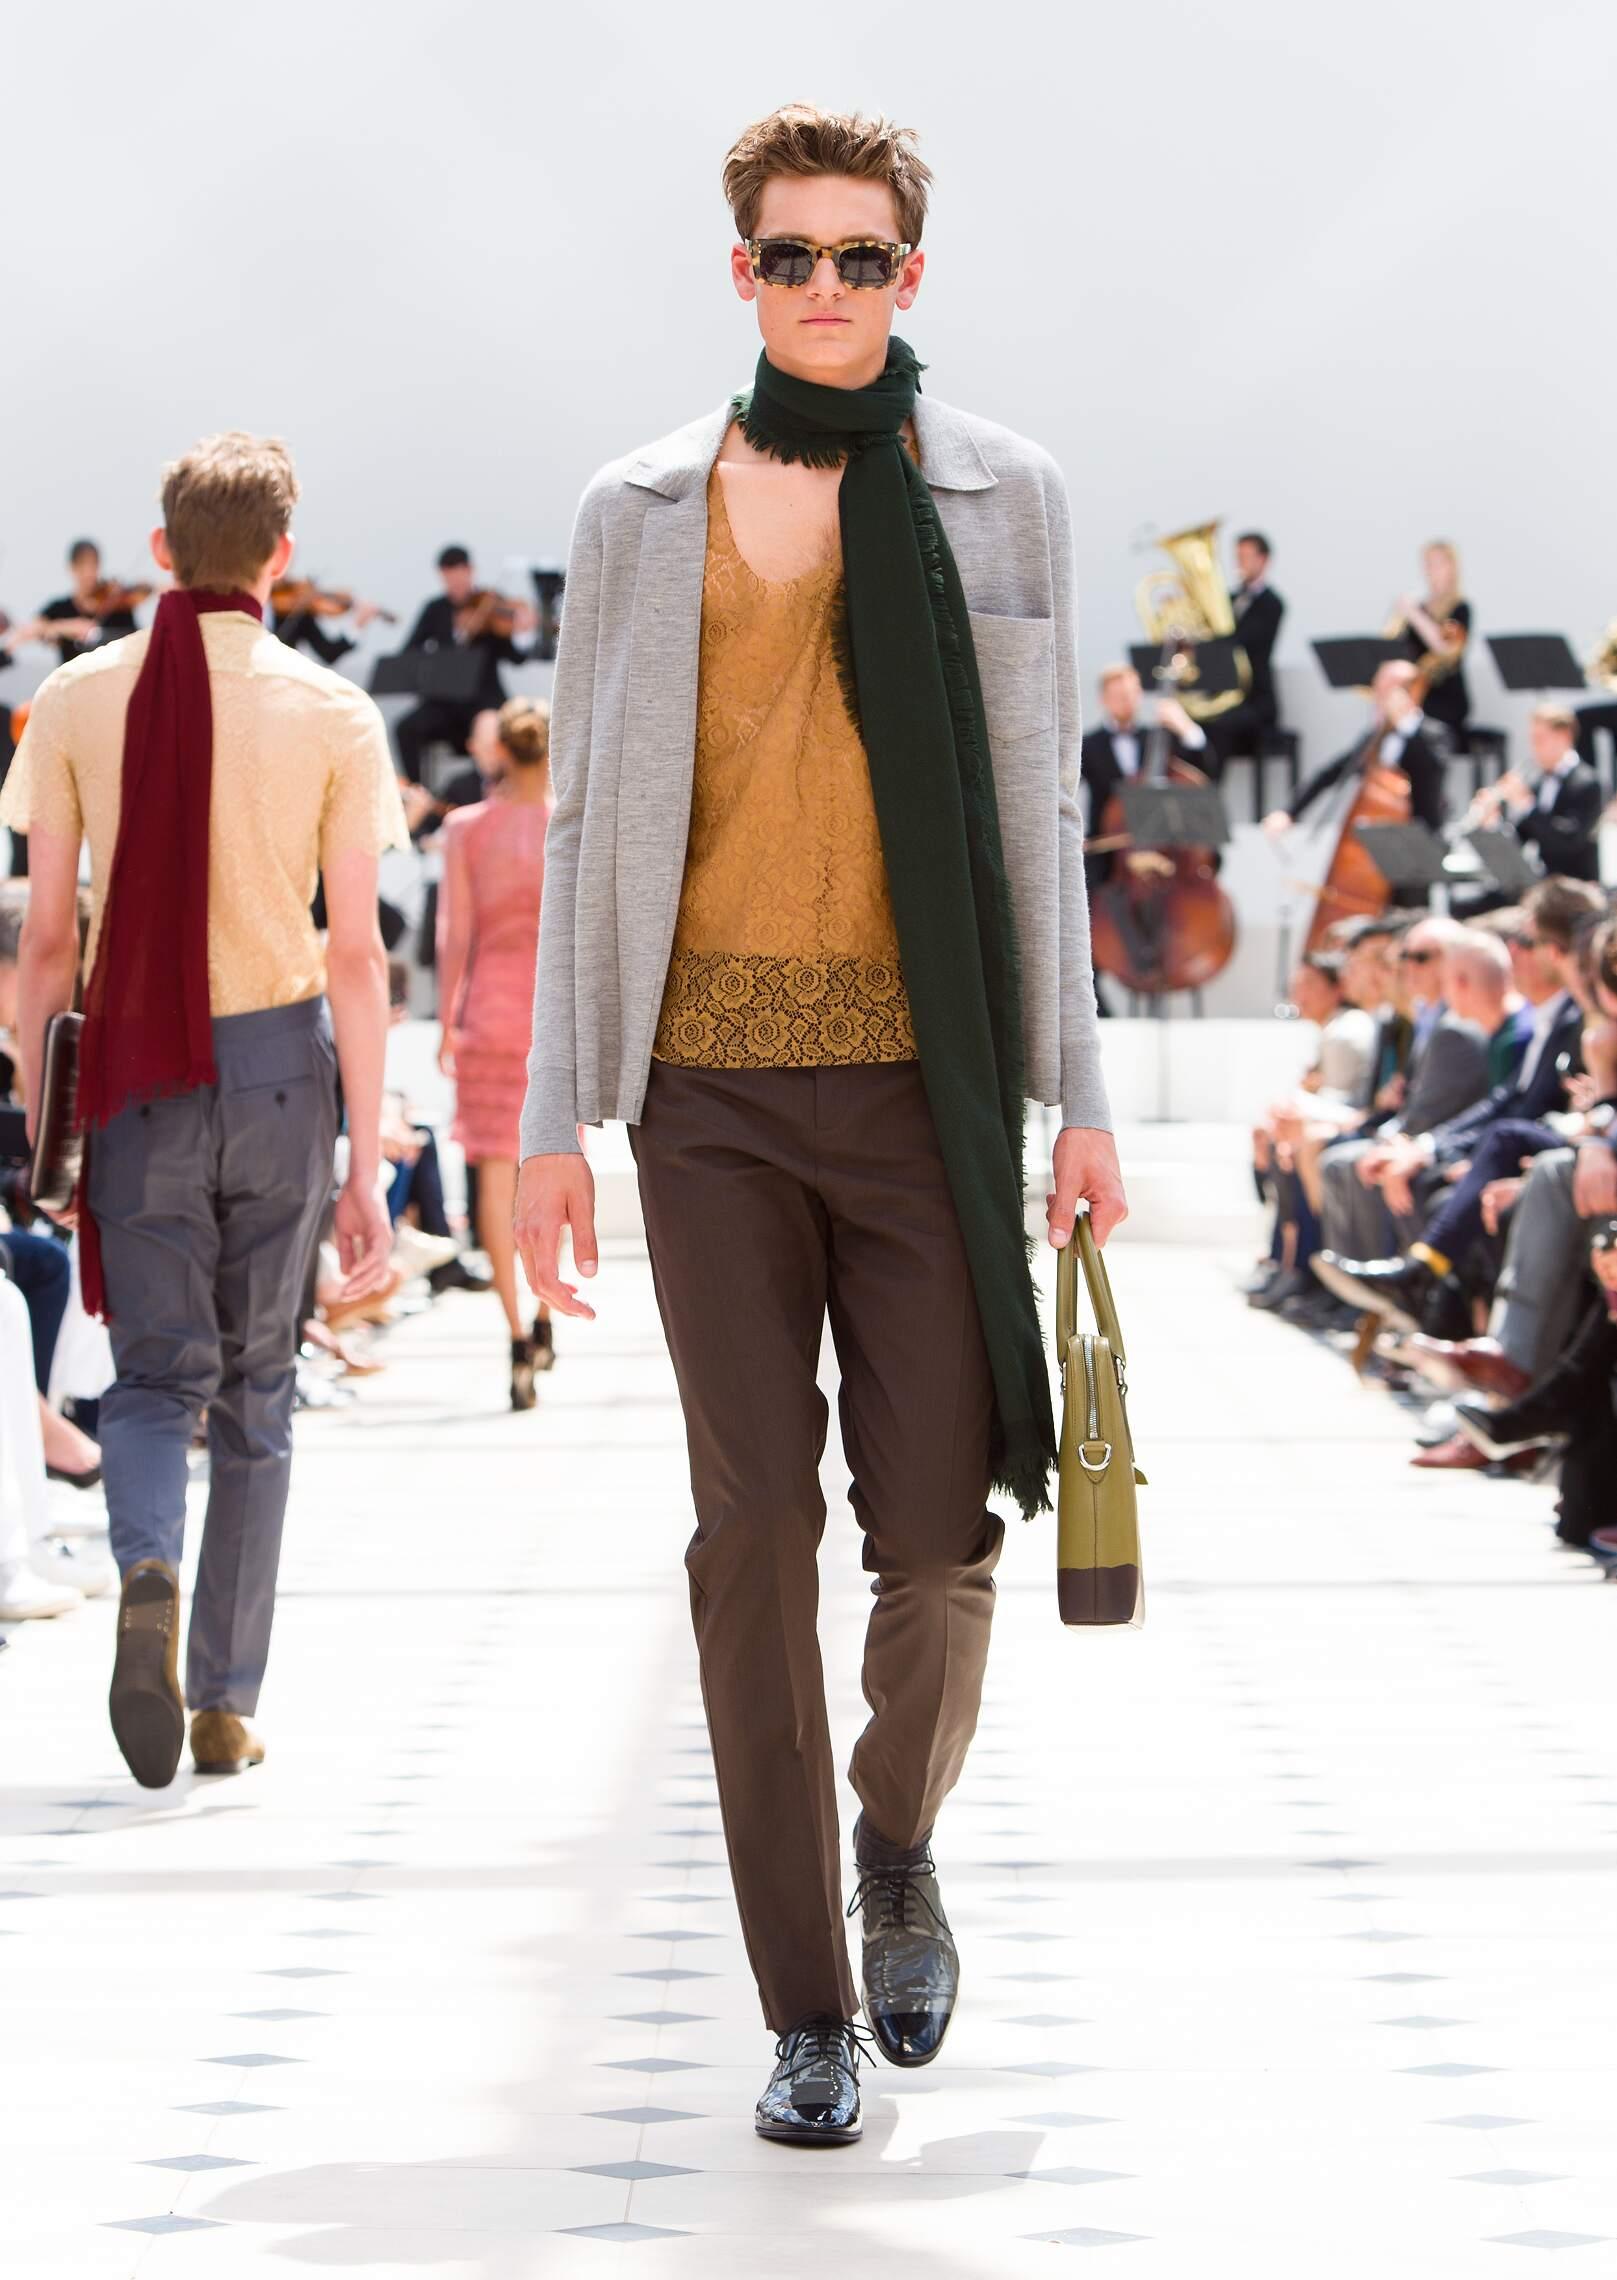 Catwalk Burberry Prorsum Spring Summer 2016 Men's Collection London Fashion Week